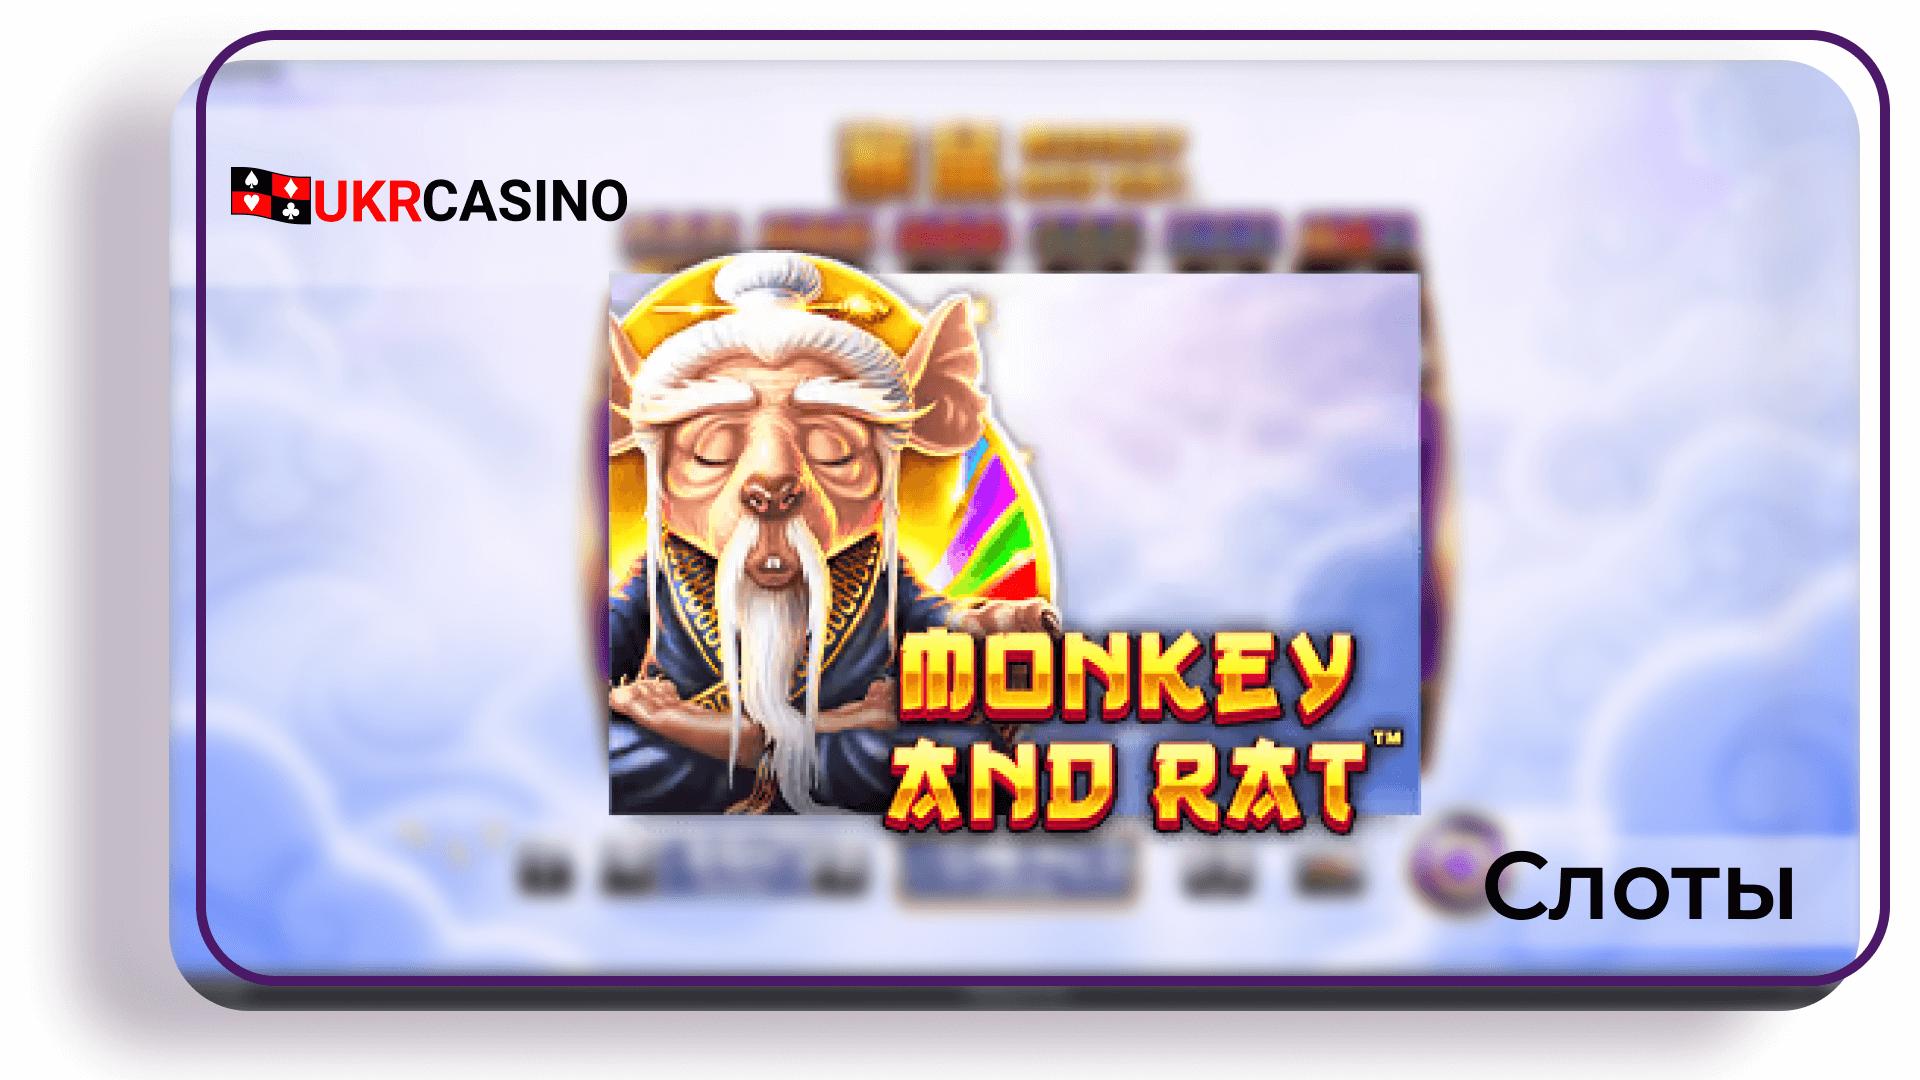 Monkey and Rat - Playtech